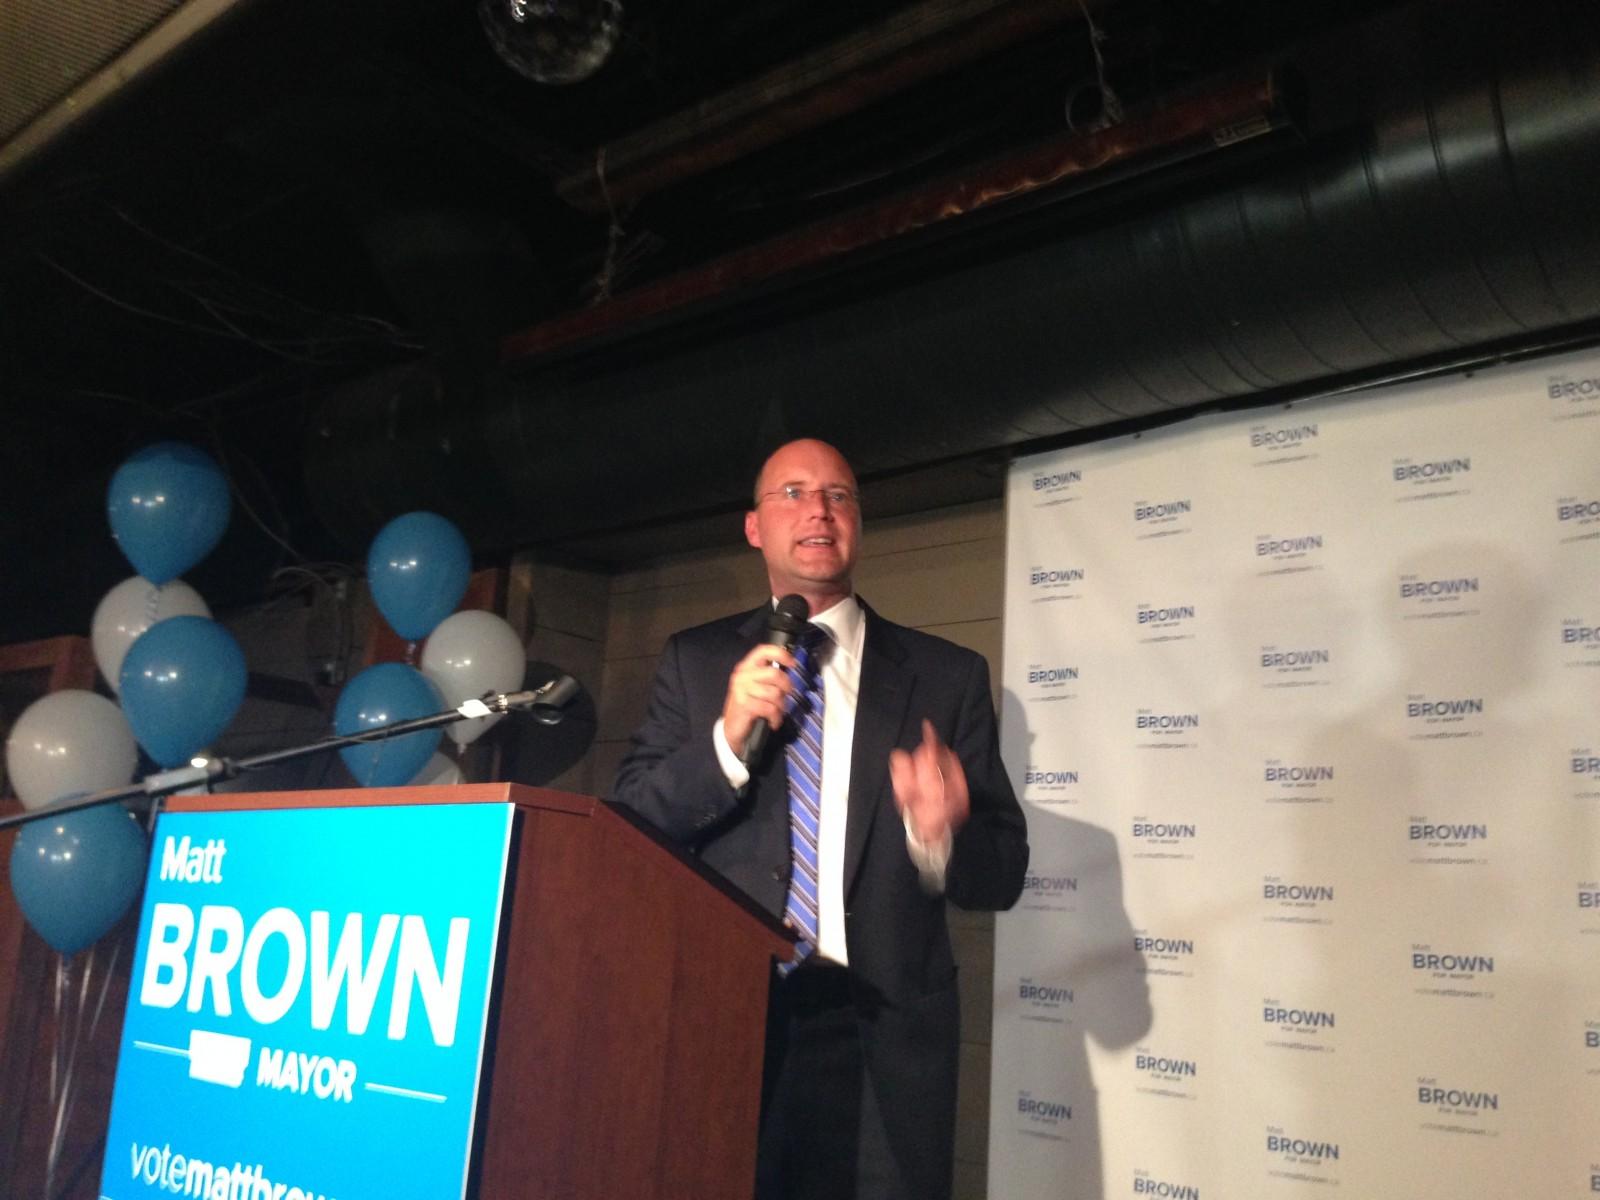 Matt Brown elected new Mayor of London